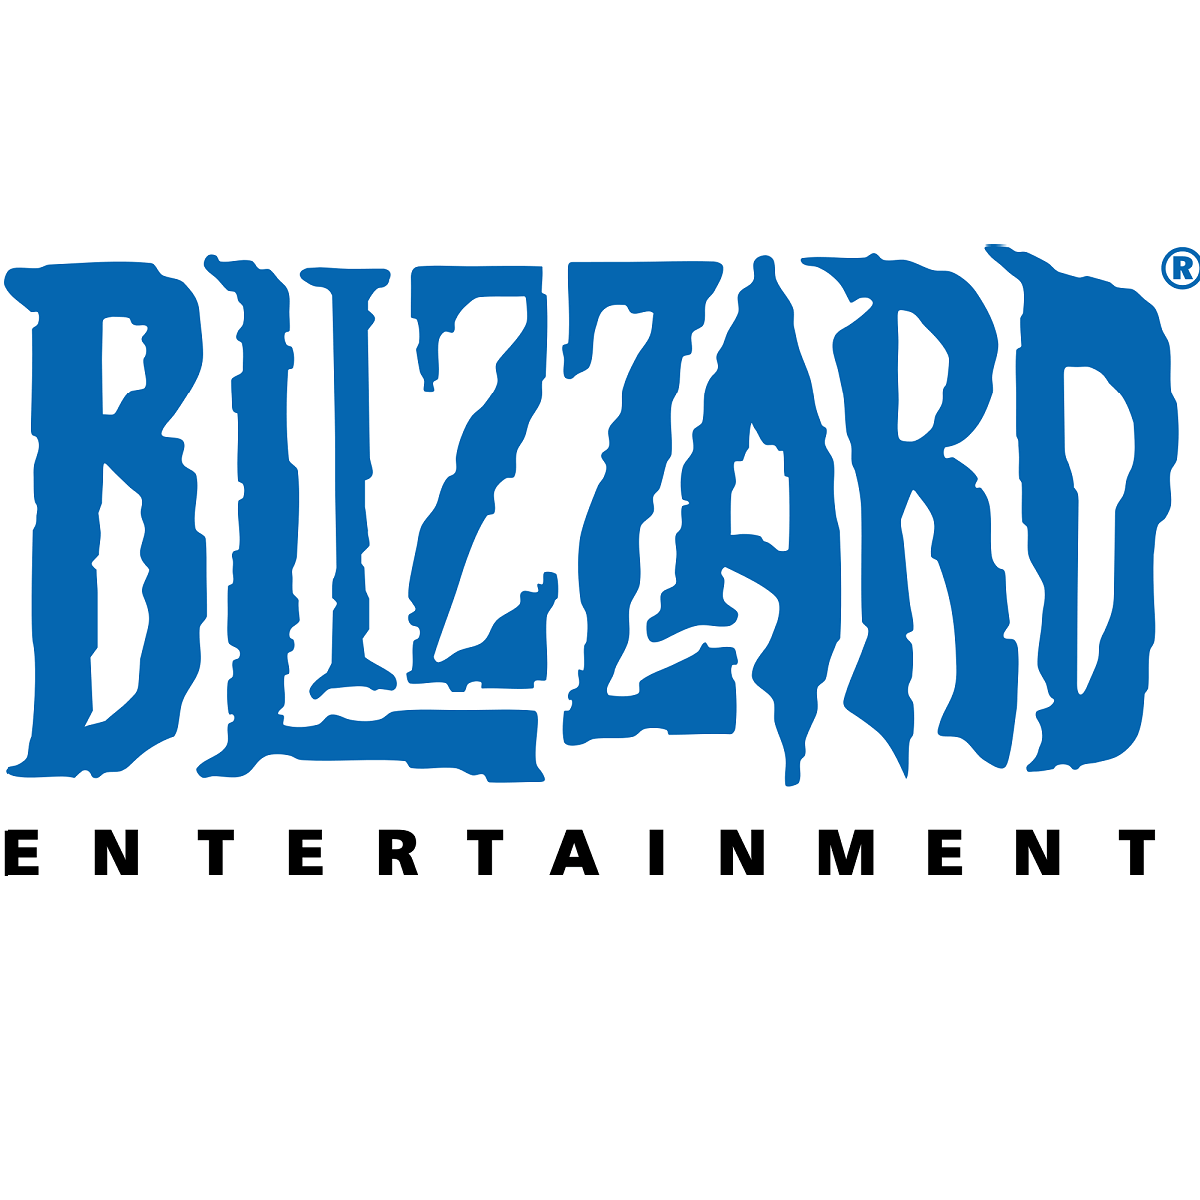 blizzard app stuck initializing 1